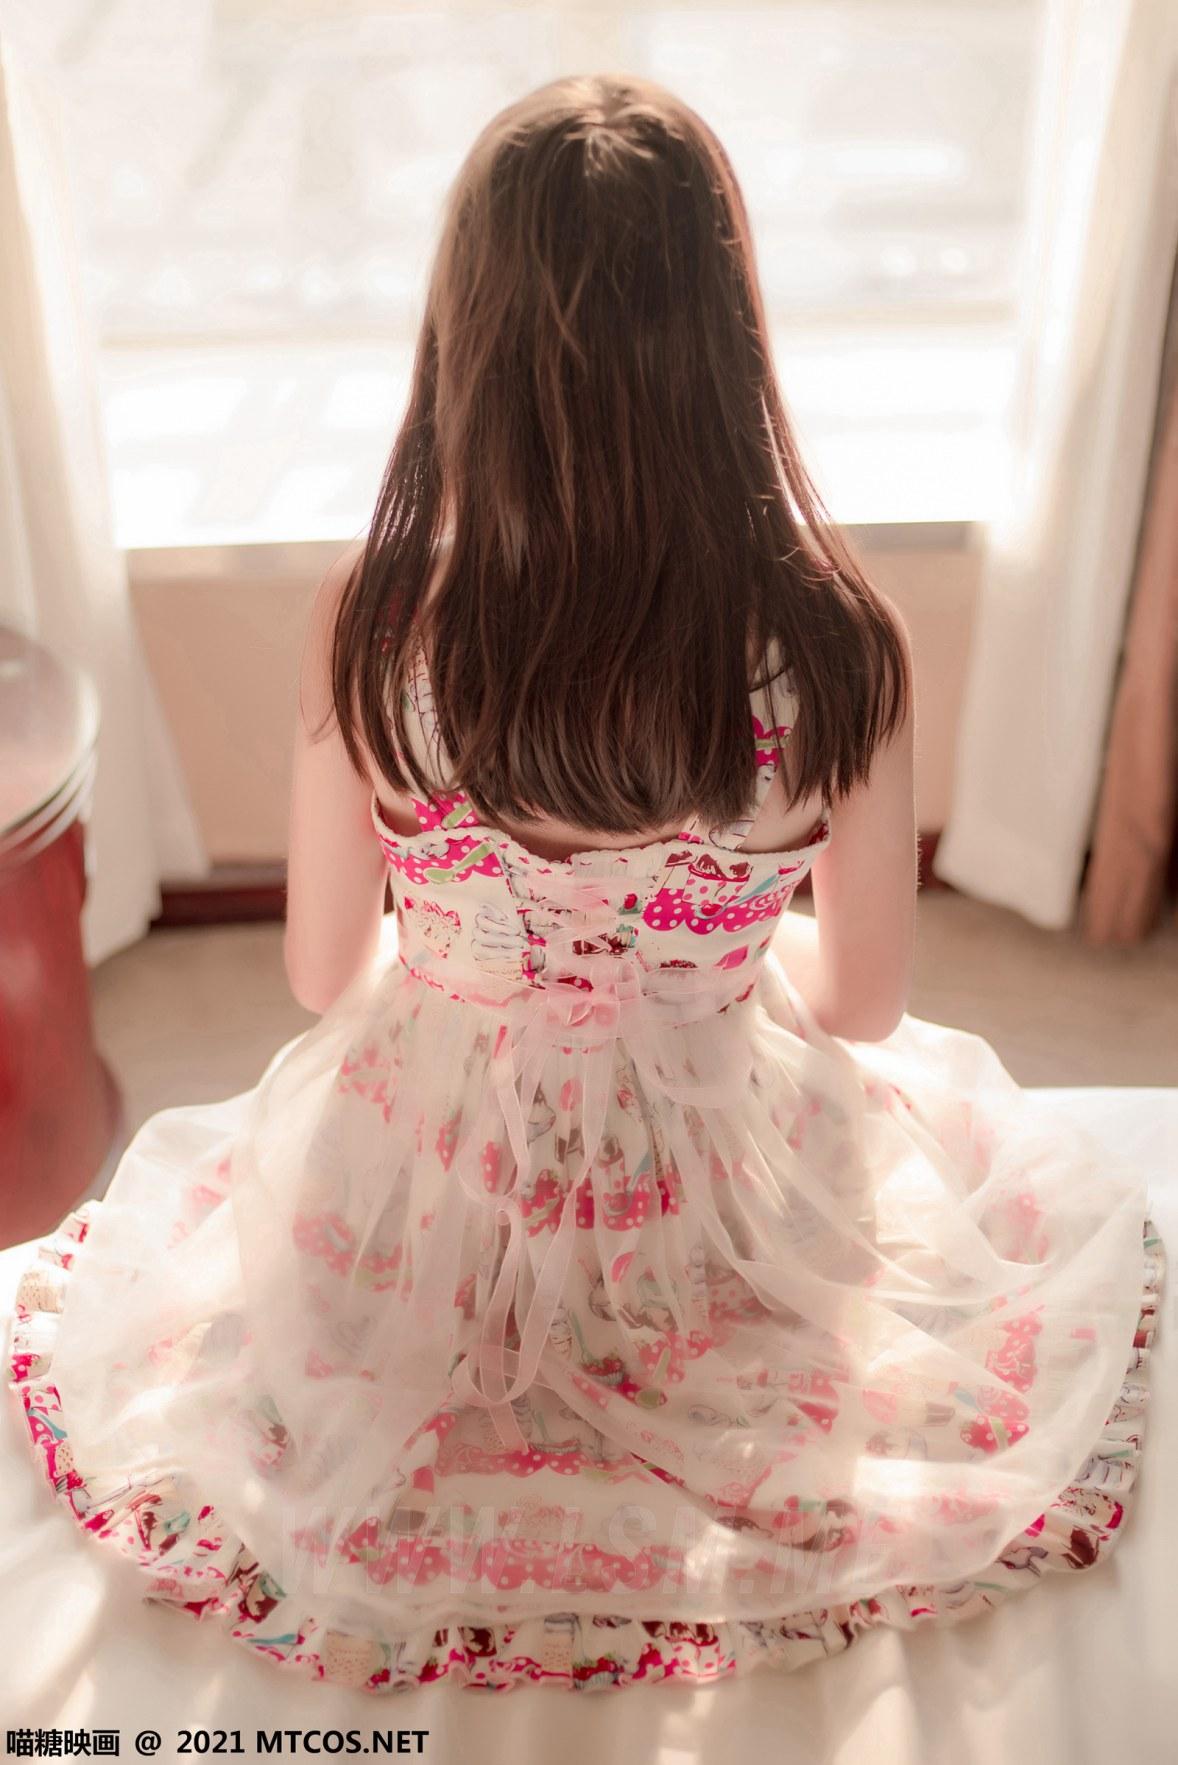 MTYH 喵糖映画 Vol.417 草莓裙子 - 1